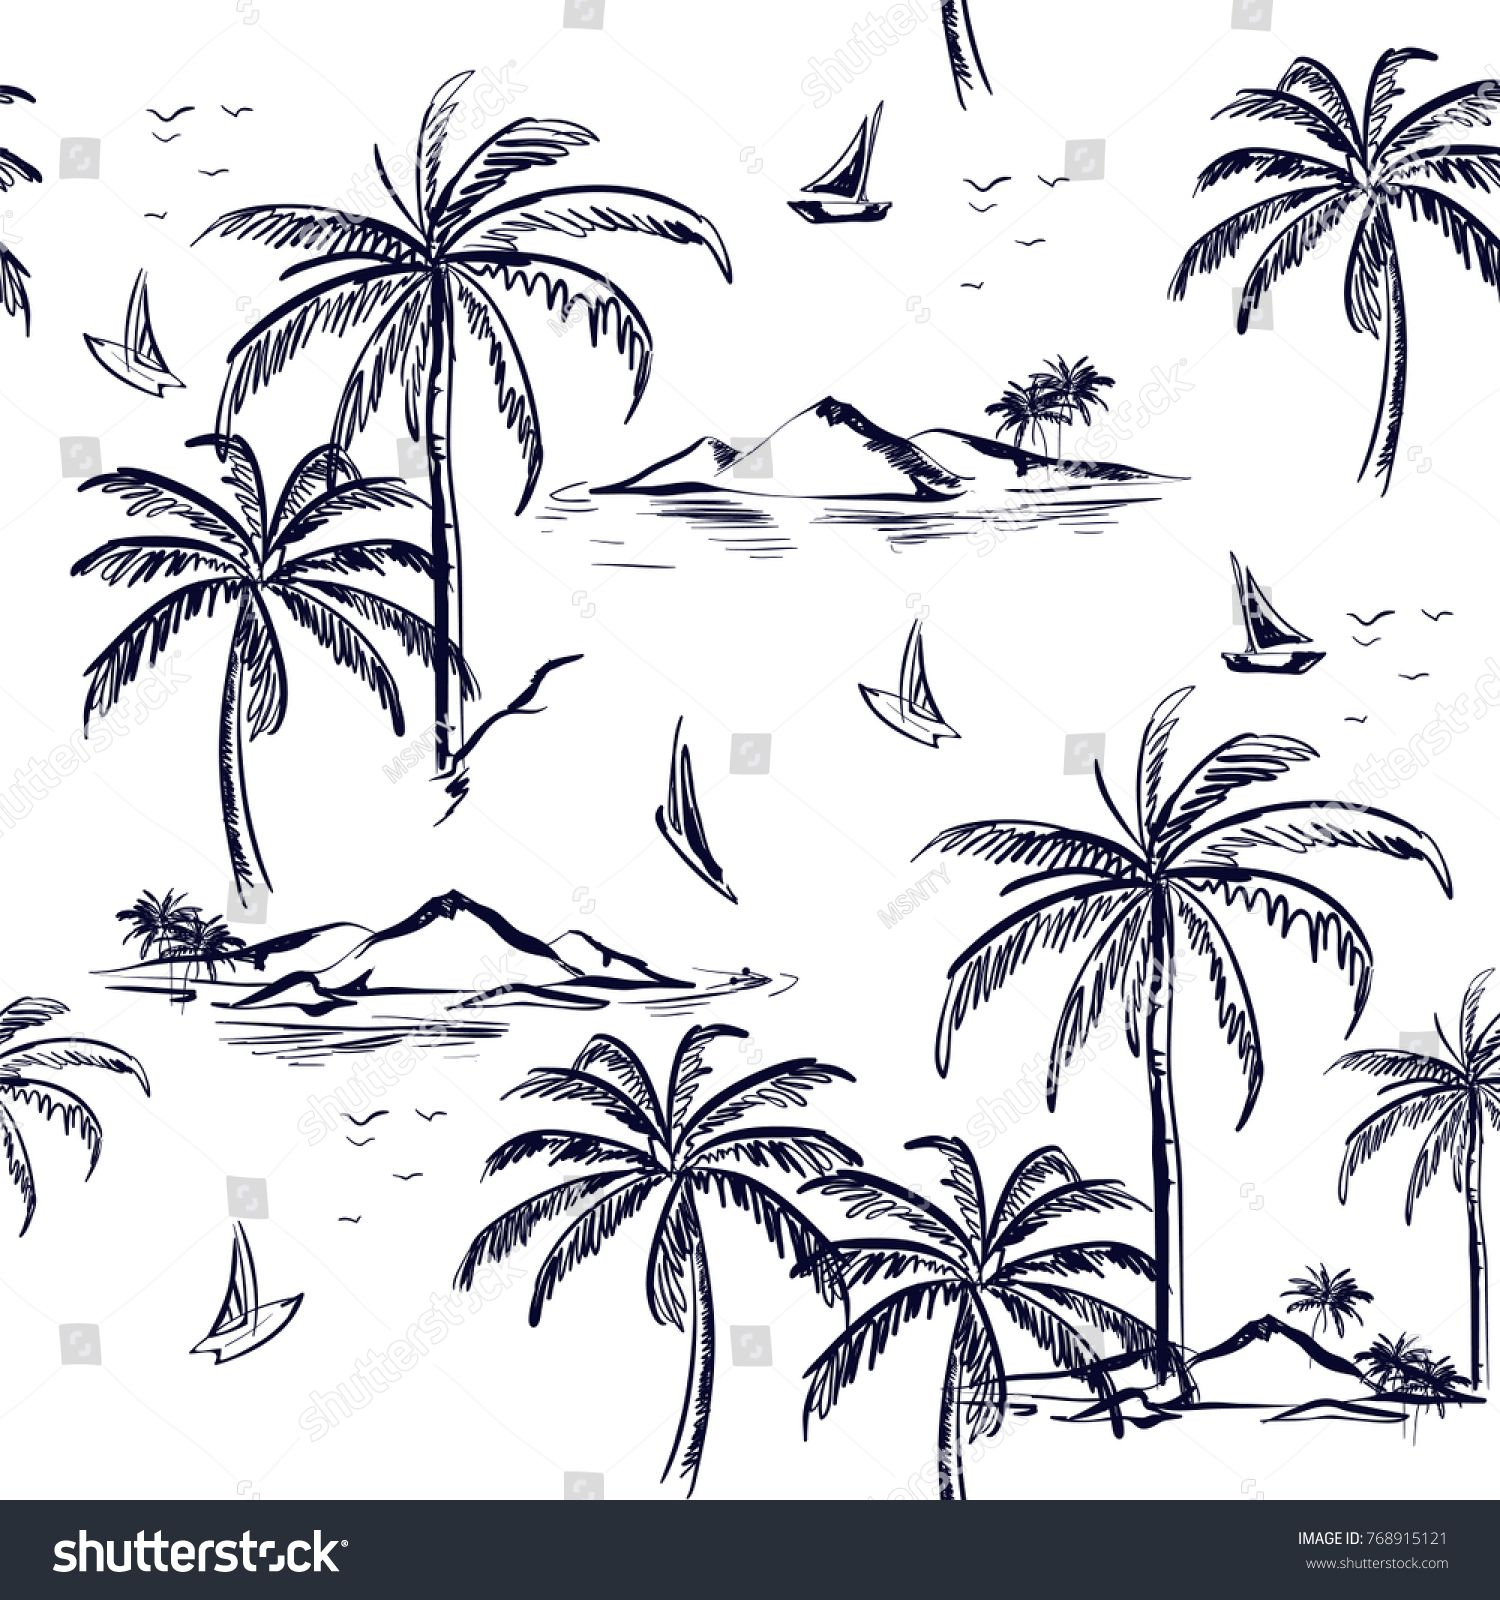 20+ Shutterstock Beach Baby Black And White Clipart